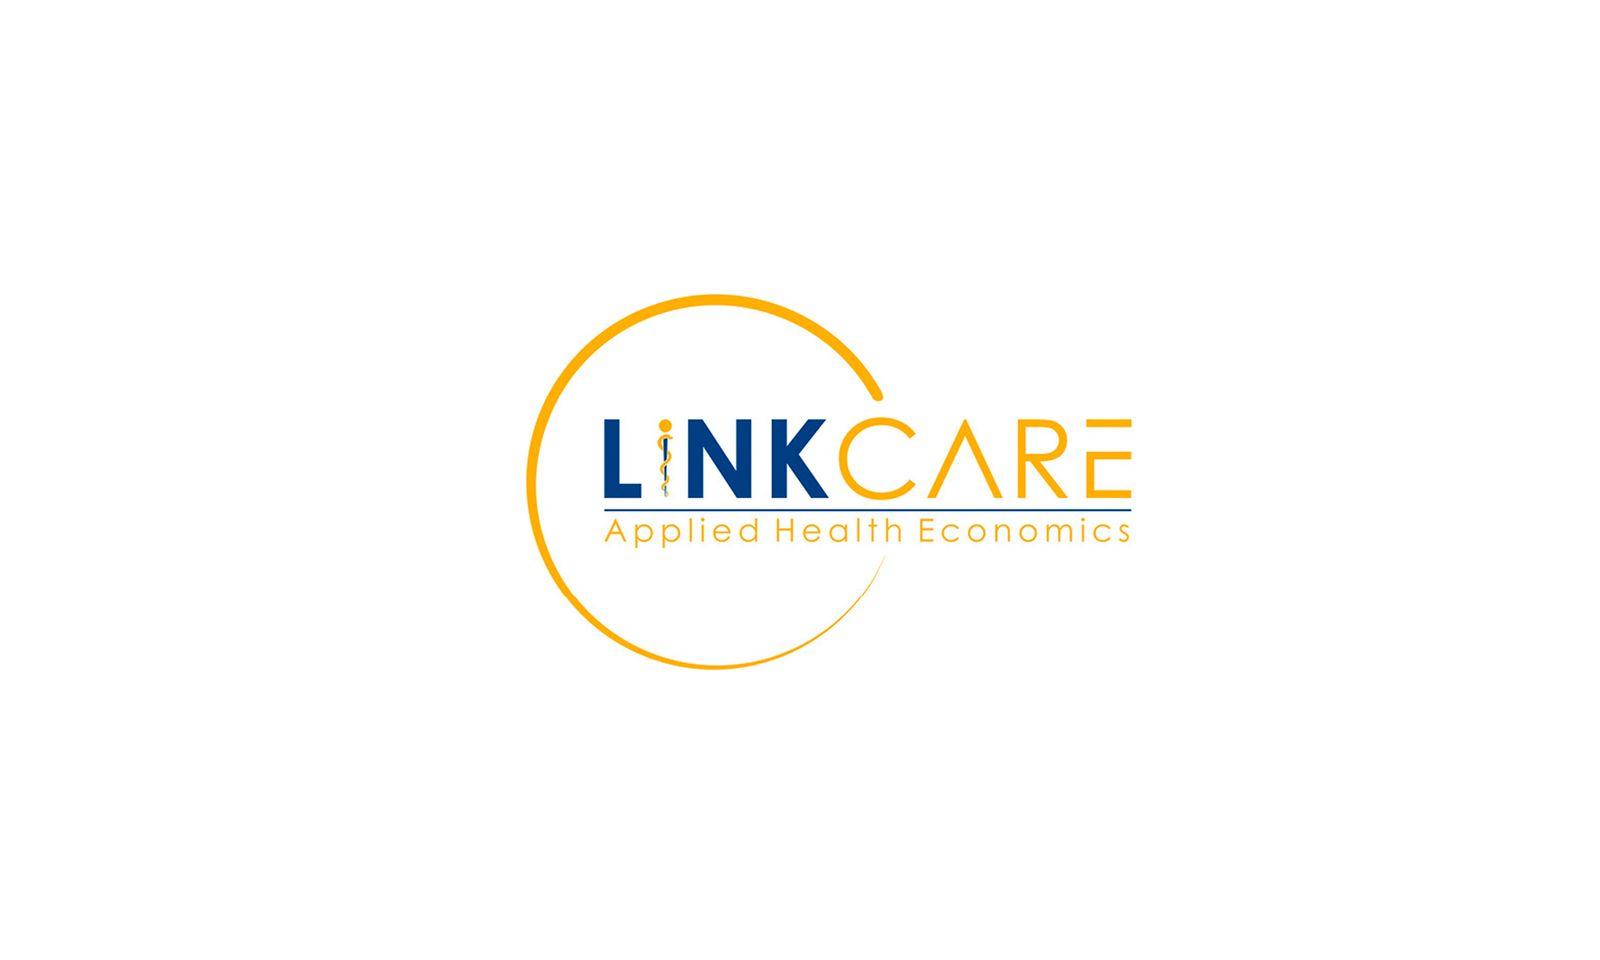 Logo Linkcare